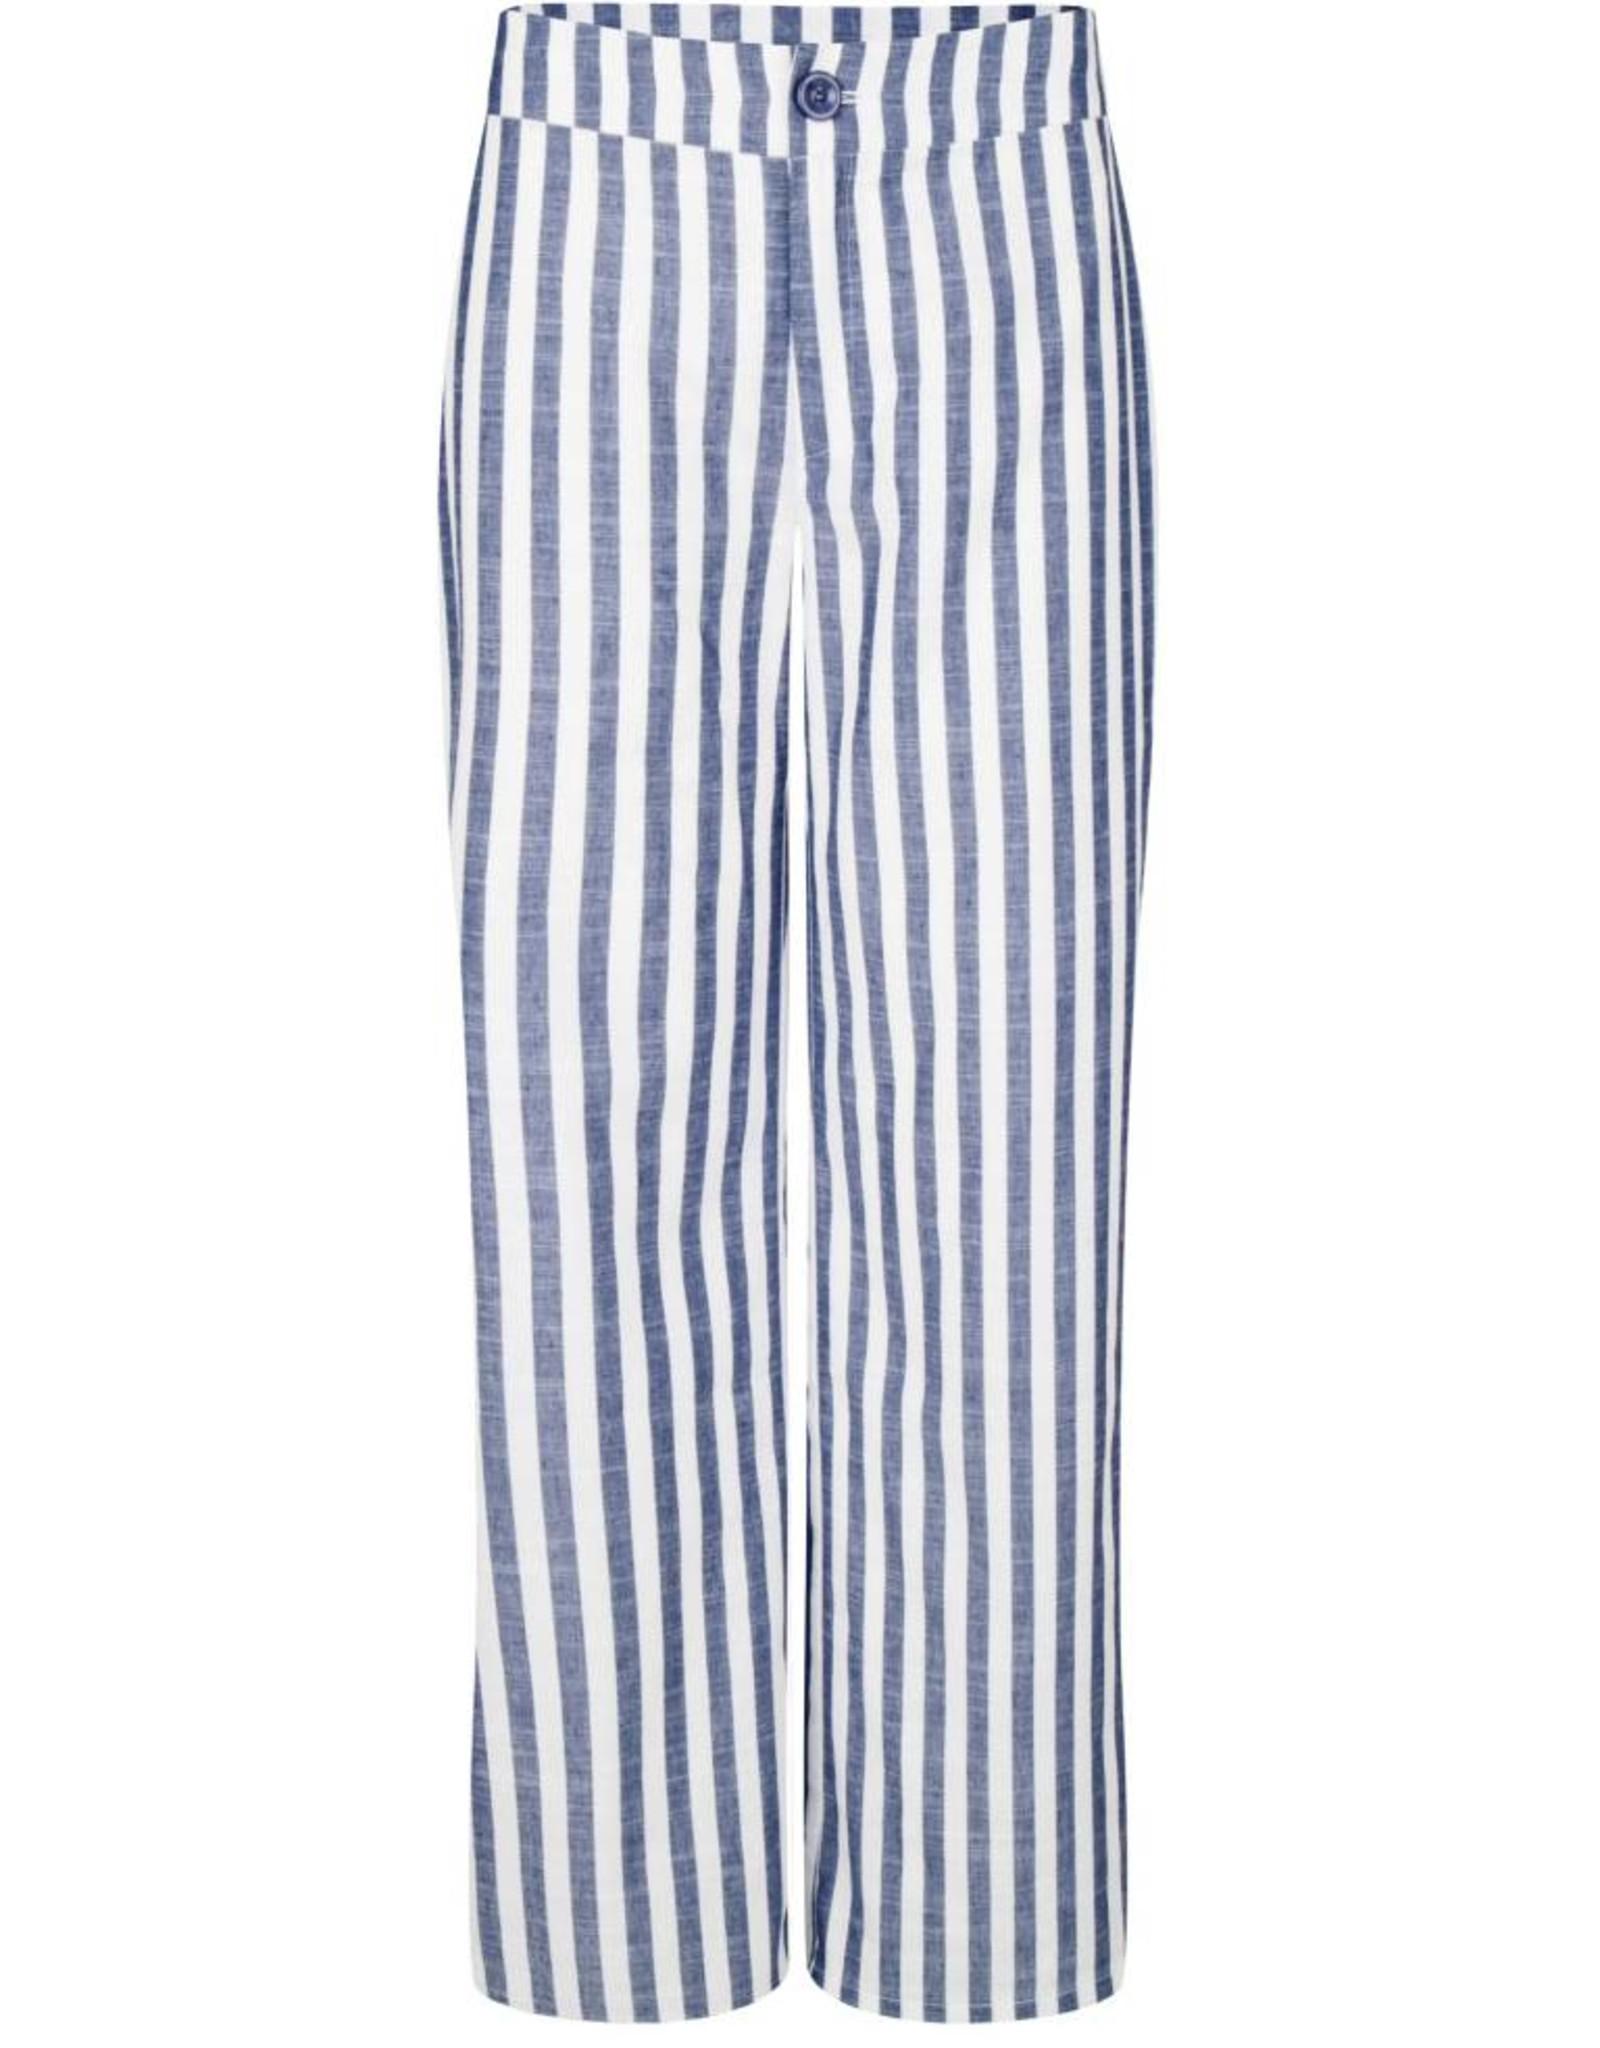 Ydence Ydence  Pants Striped Mara